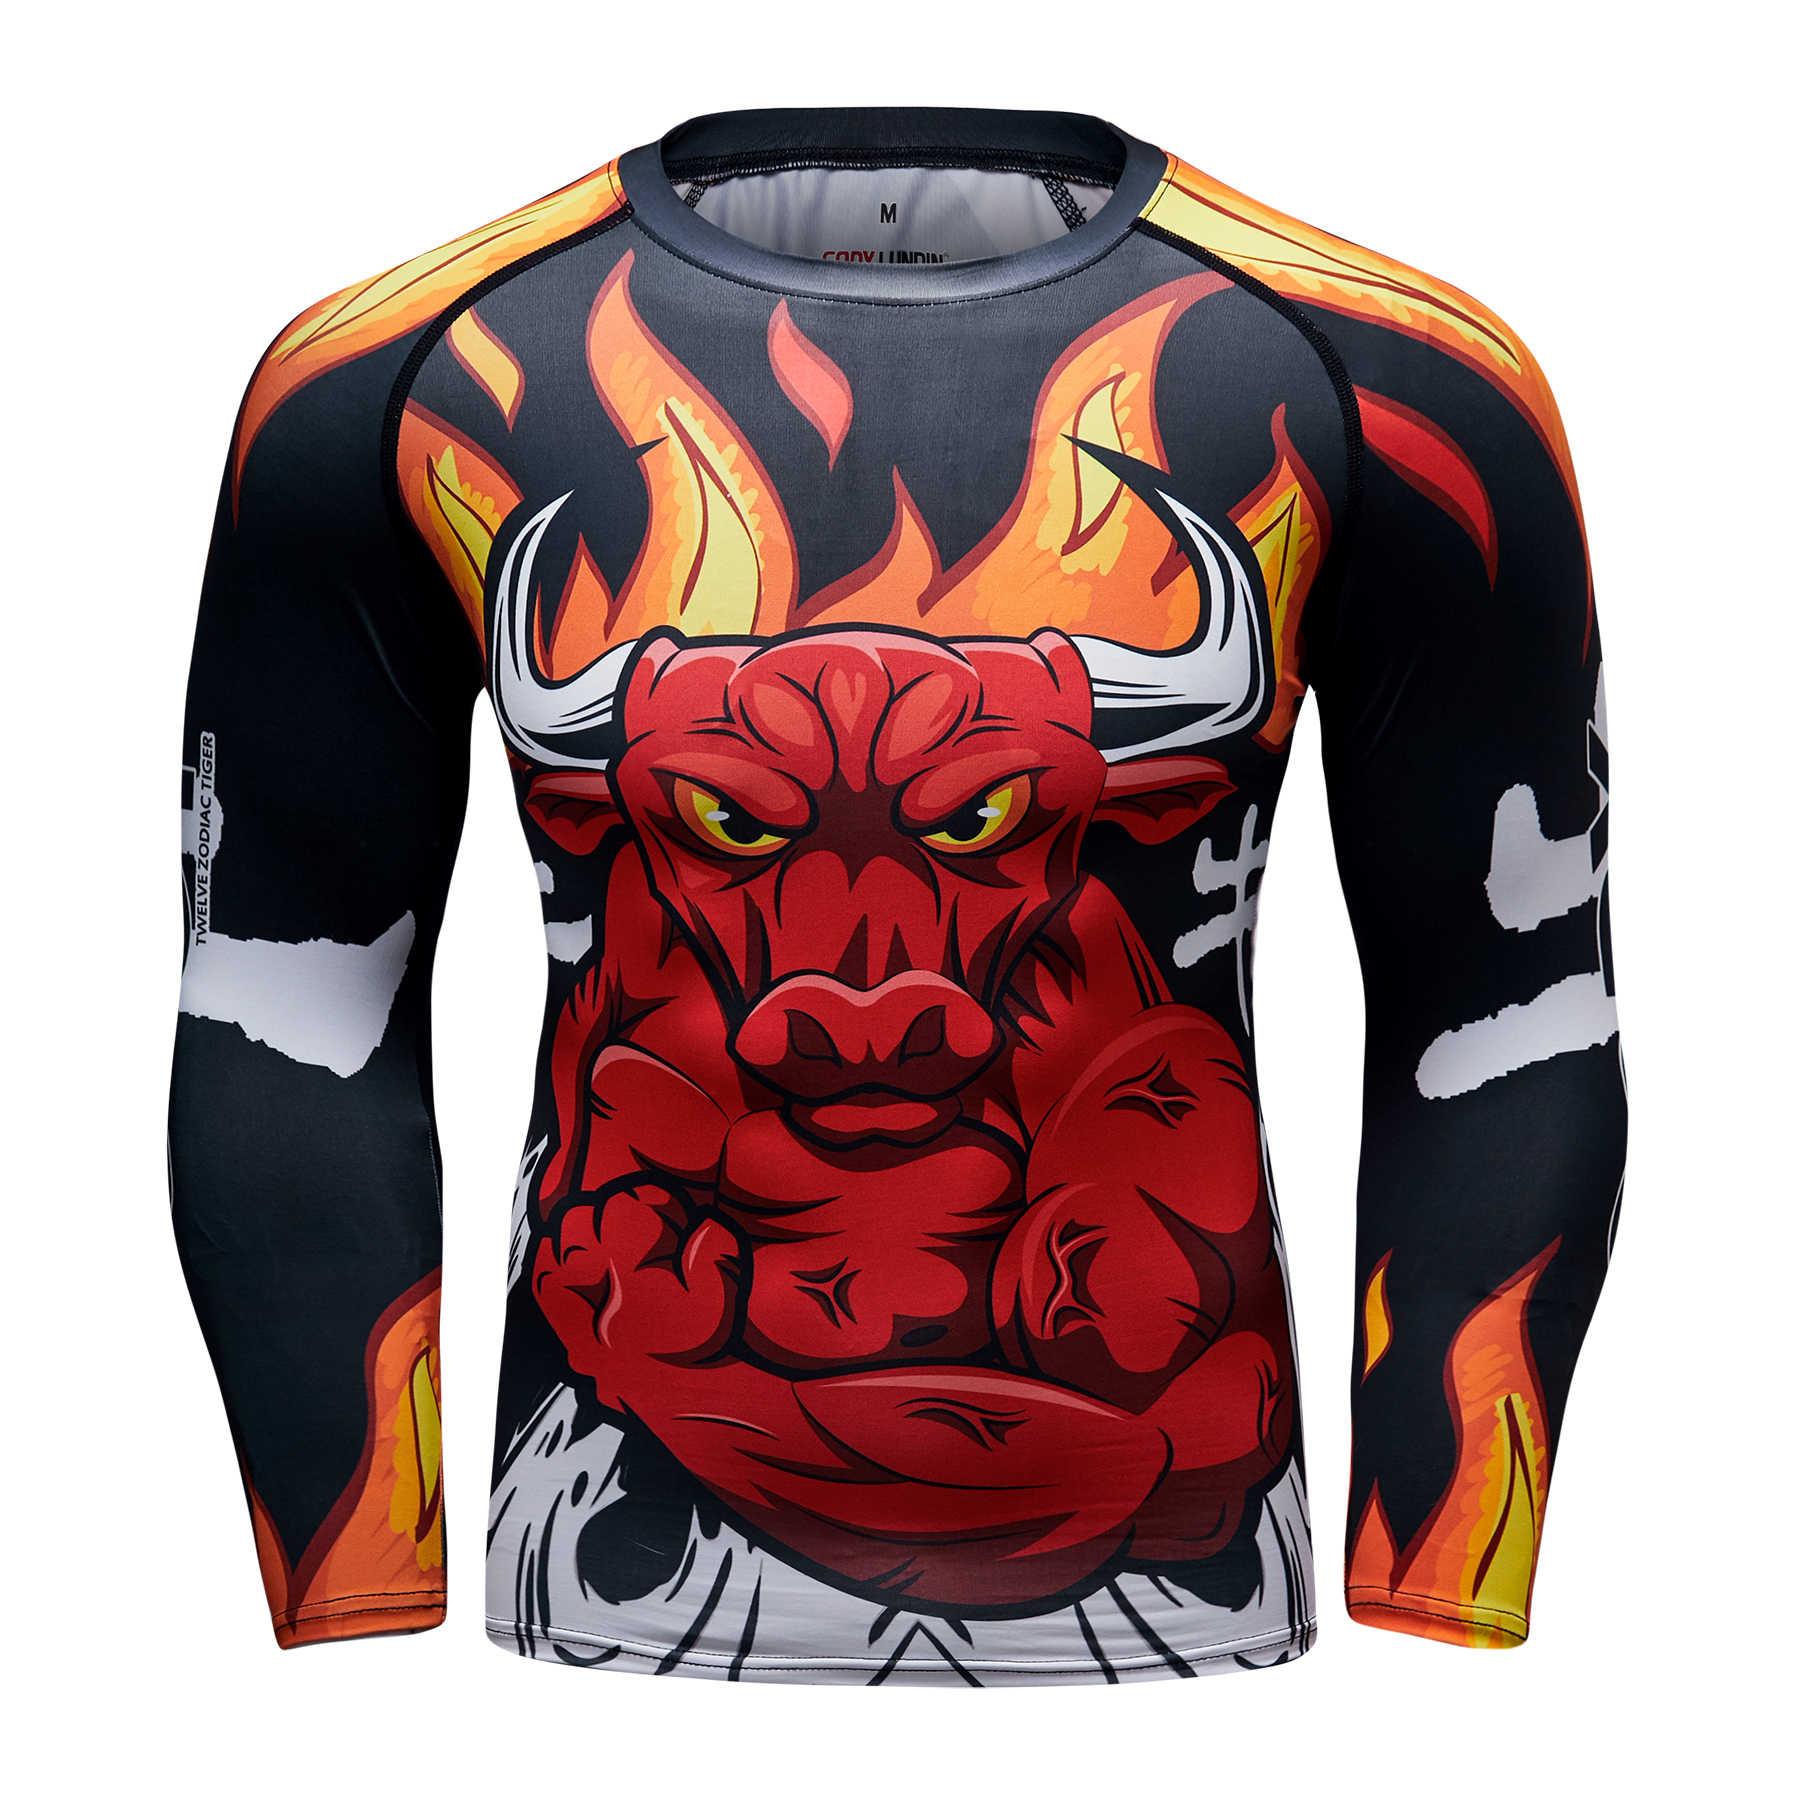 Camisa de compressão rashguard rashguard lange mouwen 3d afdrukken camiseta mma fitness mannen sneldrogende halterofilismo topo